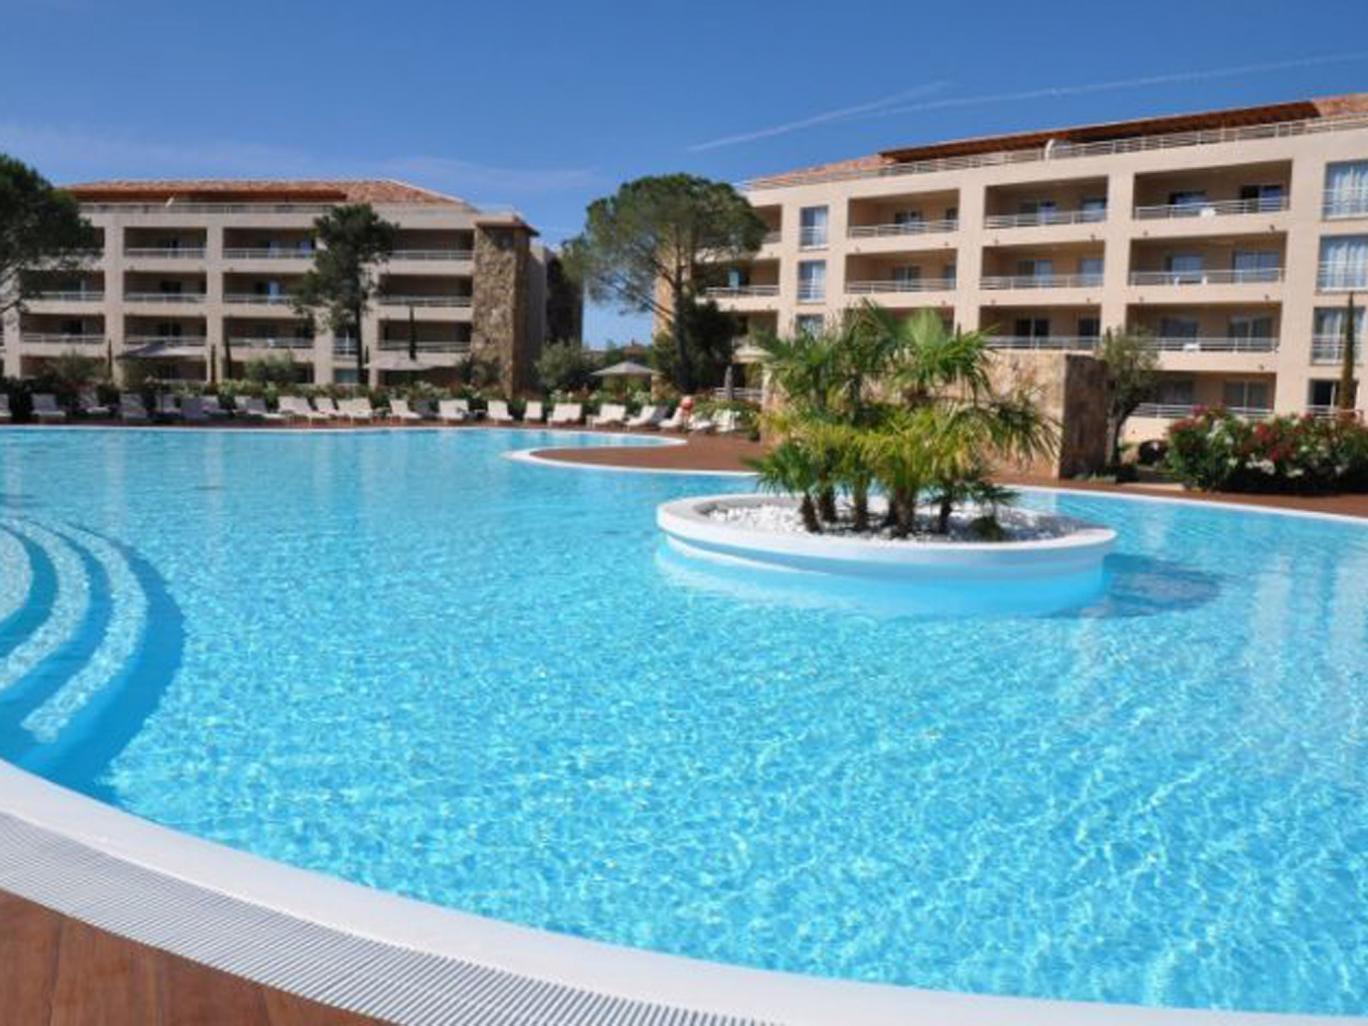 £822 - Just Corsica